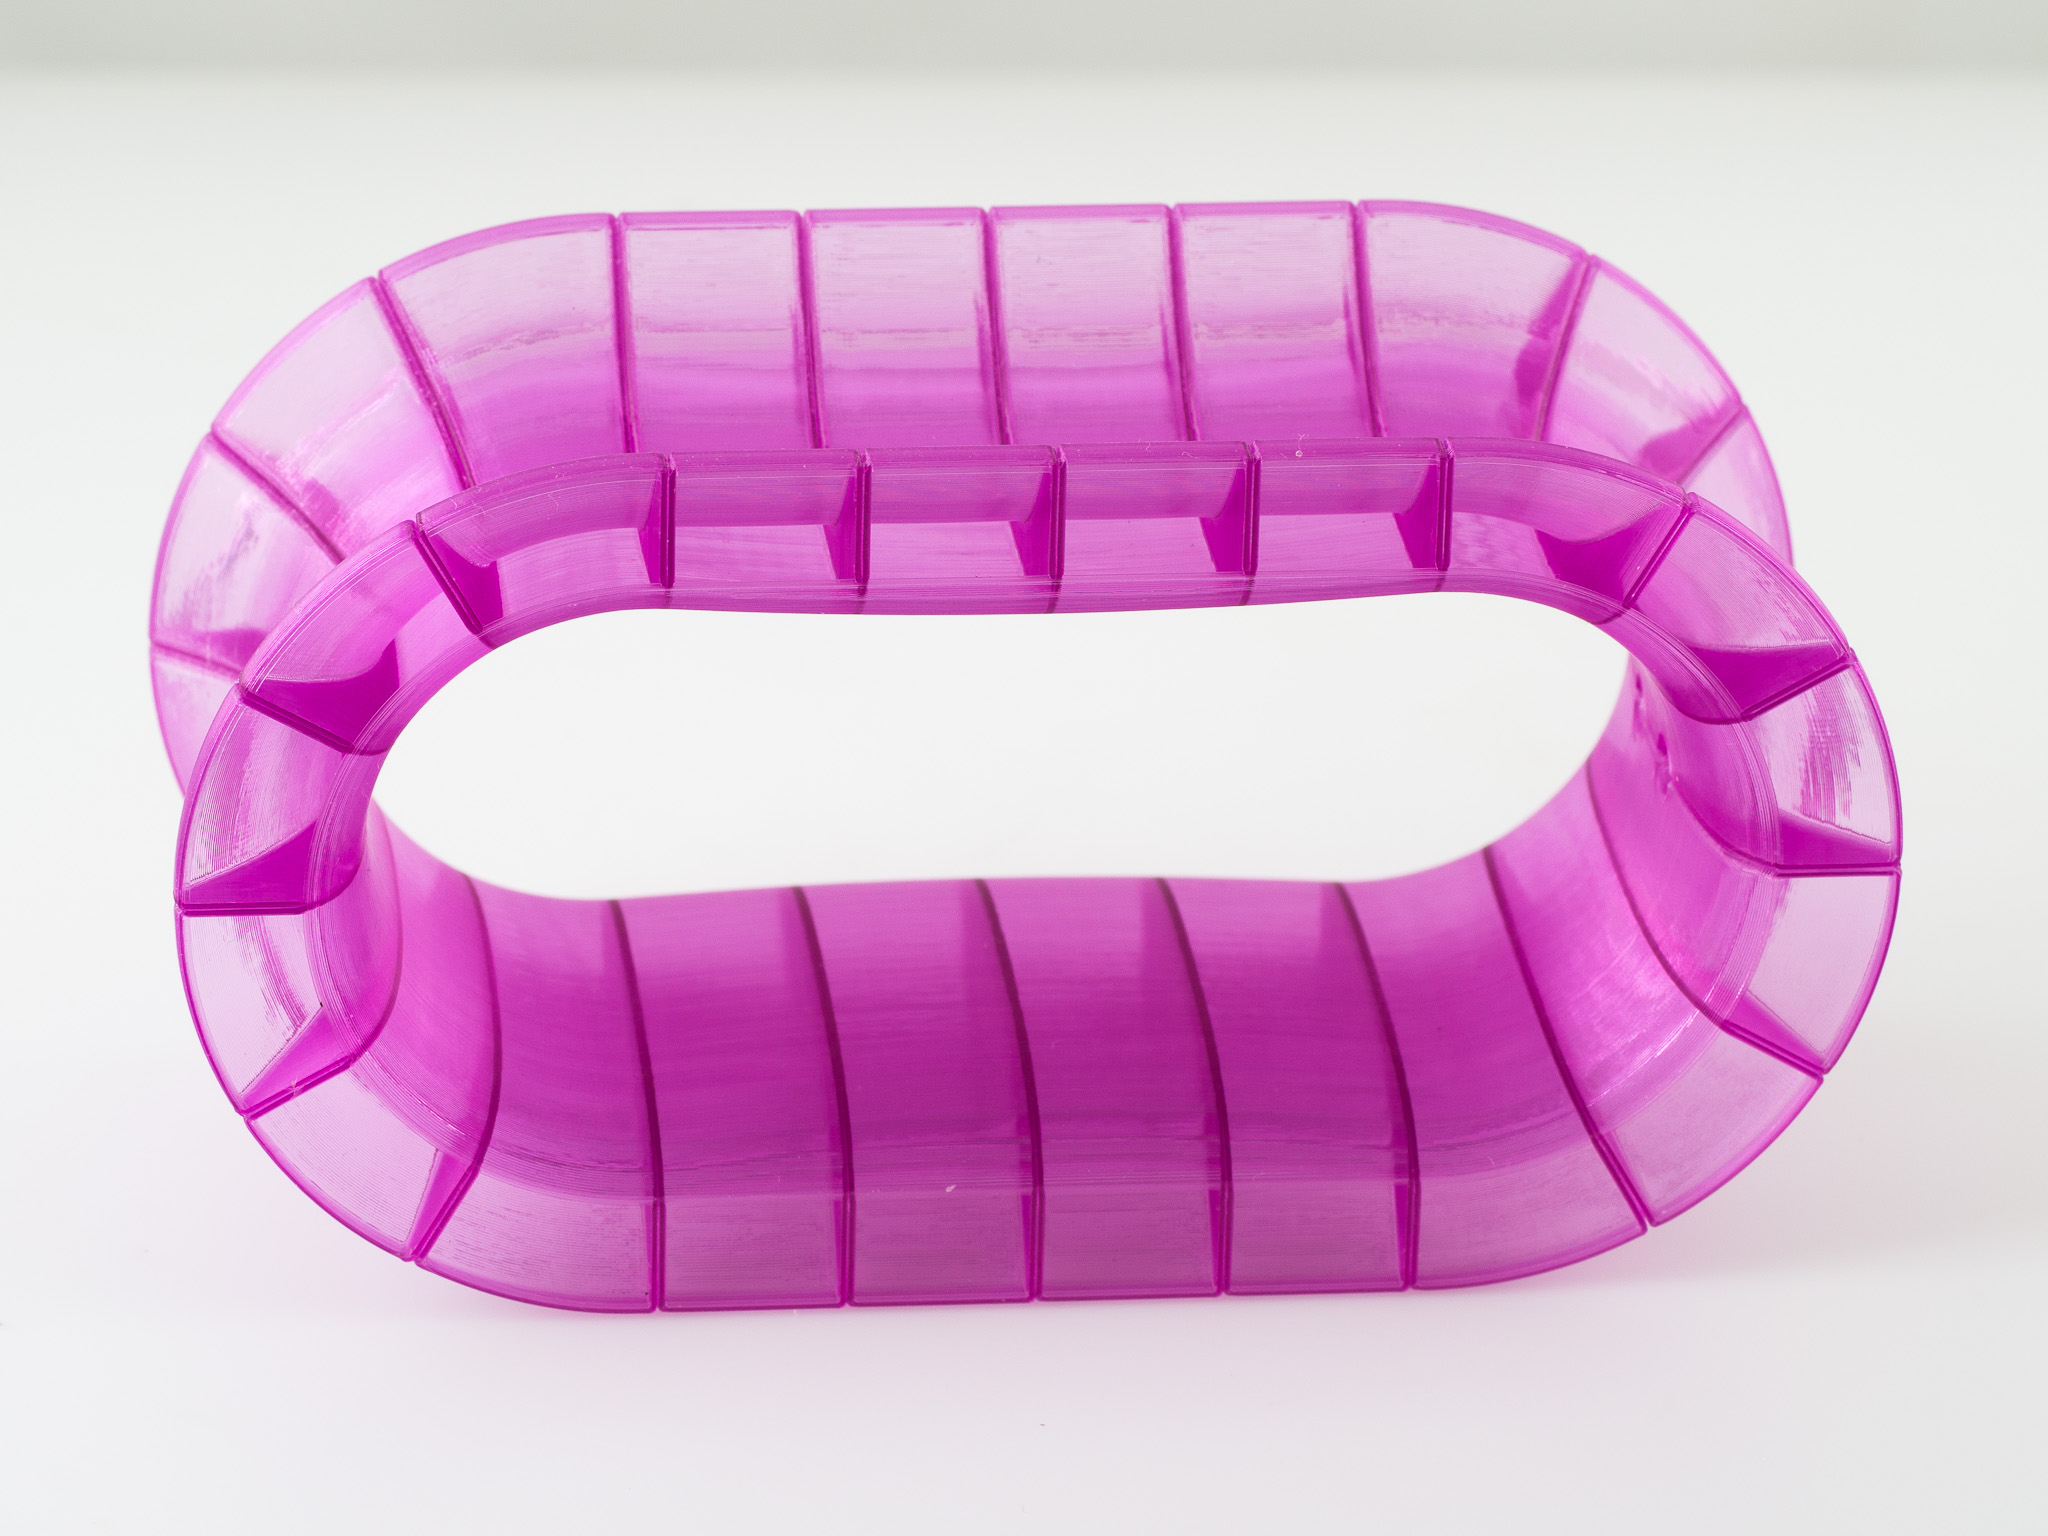 IMGP5622.jpg Download free STL file Paracord Vase Spool • 3D print model, WalterHsiao